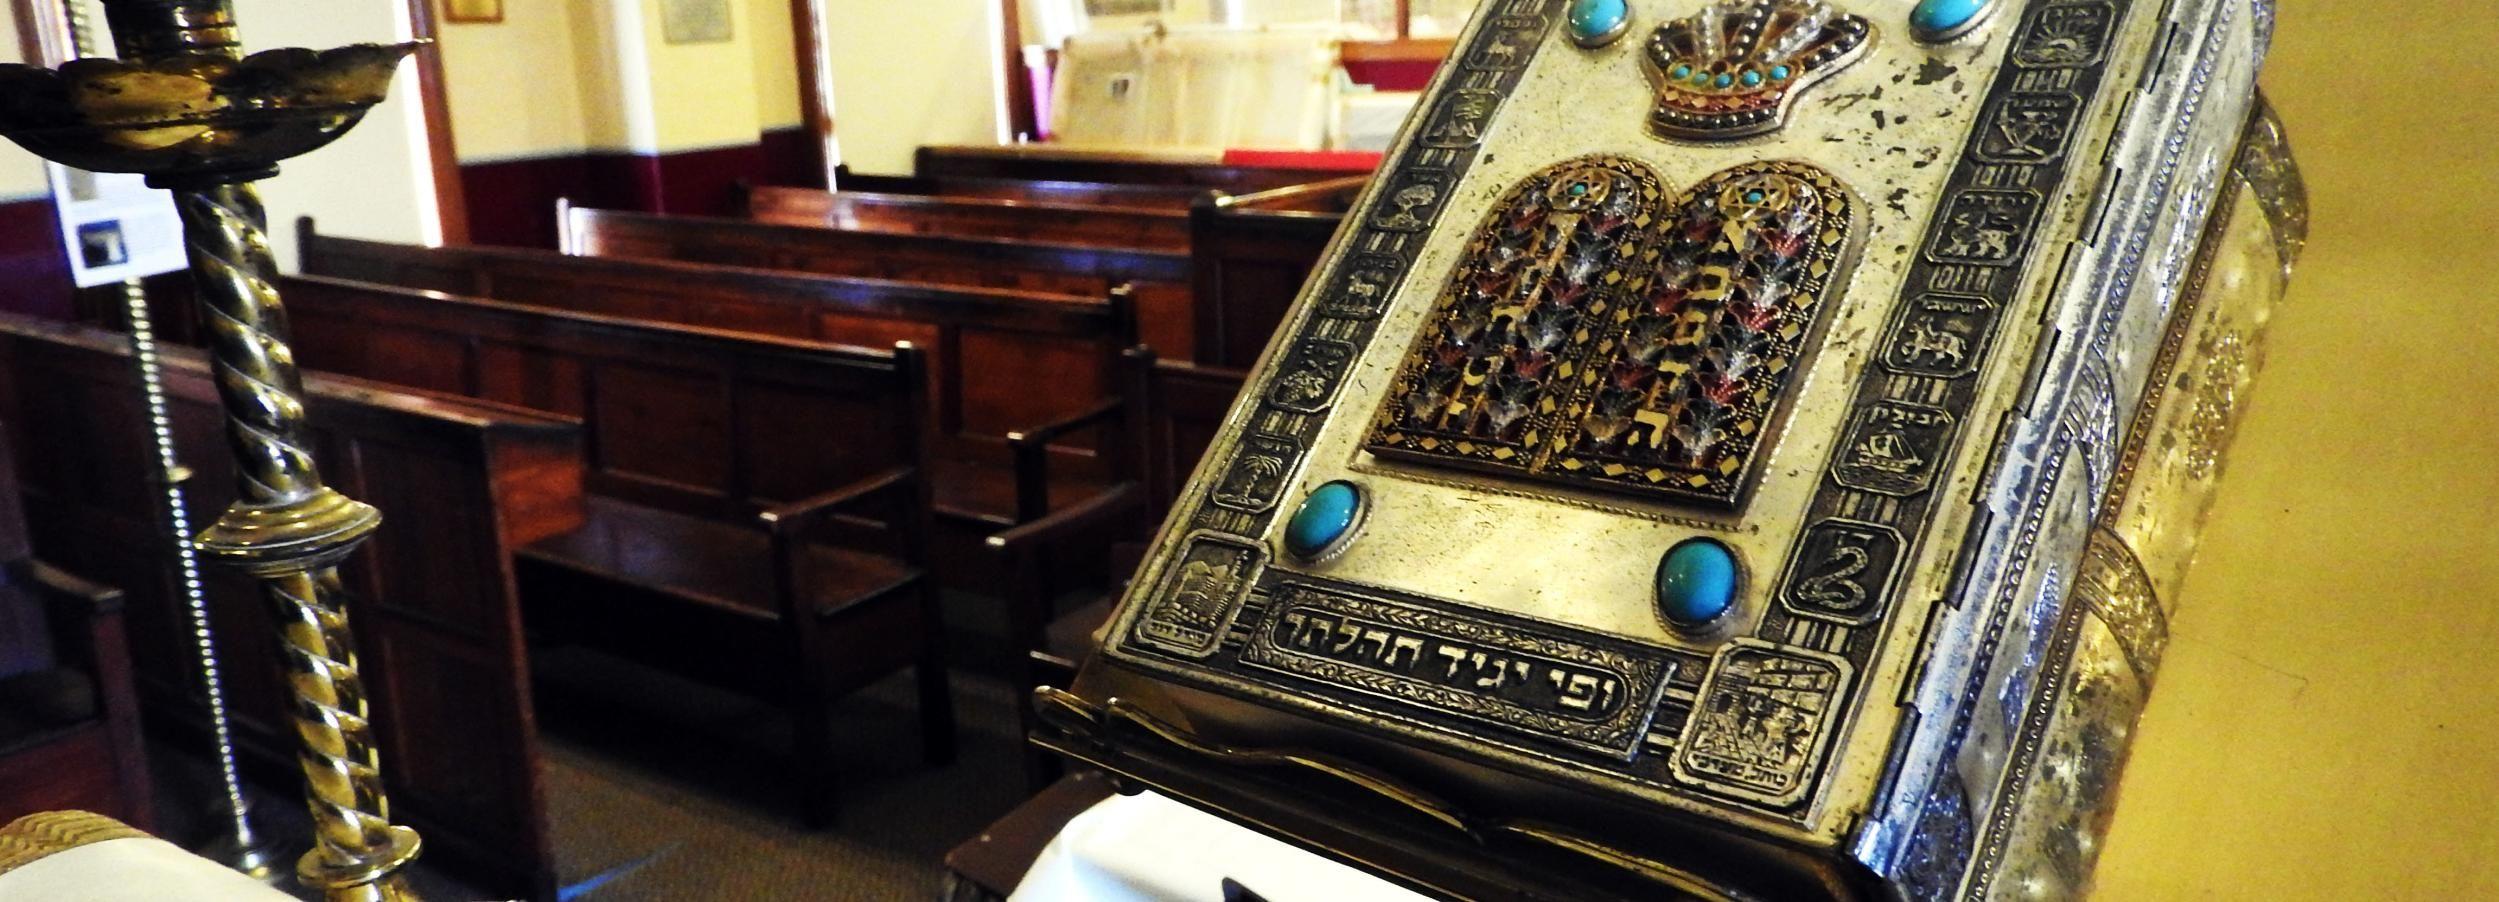 Jewish History of Dublin: 3-Hour Walking Tour